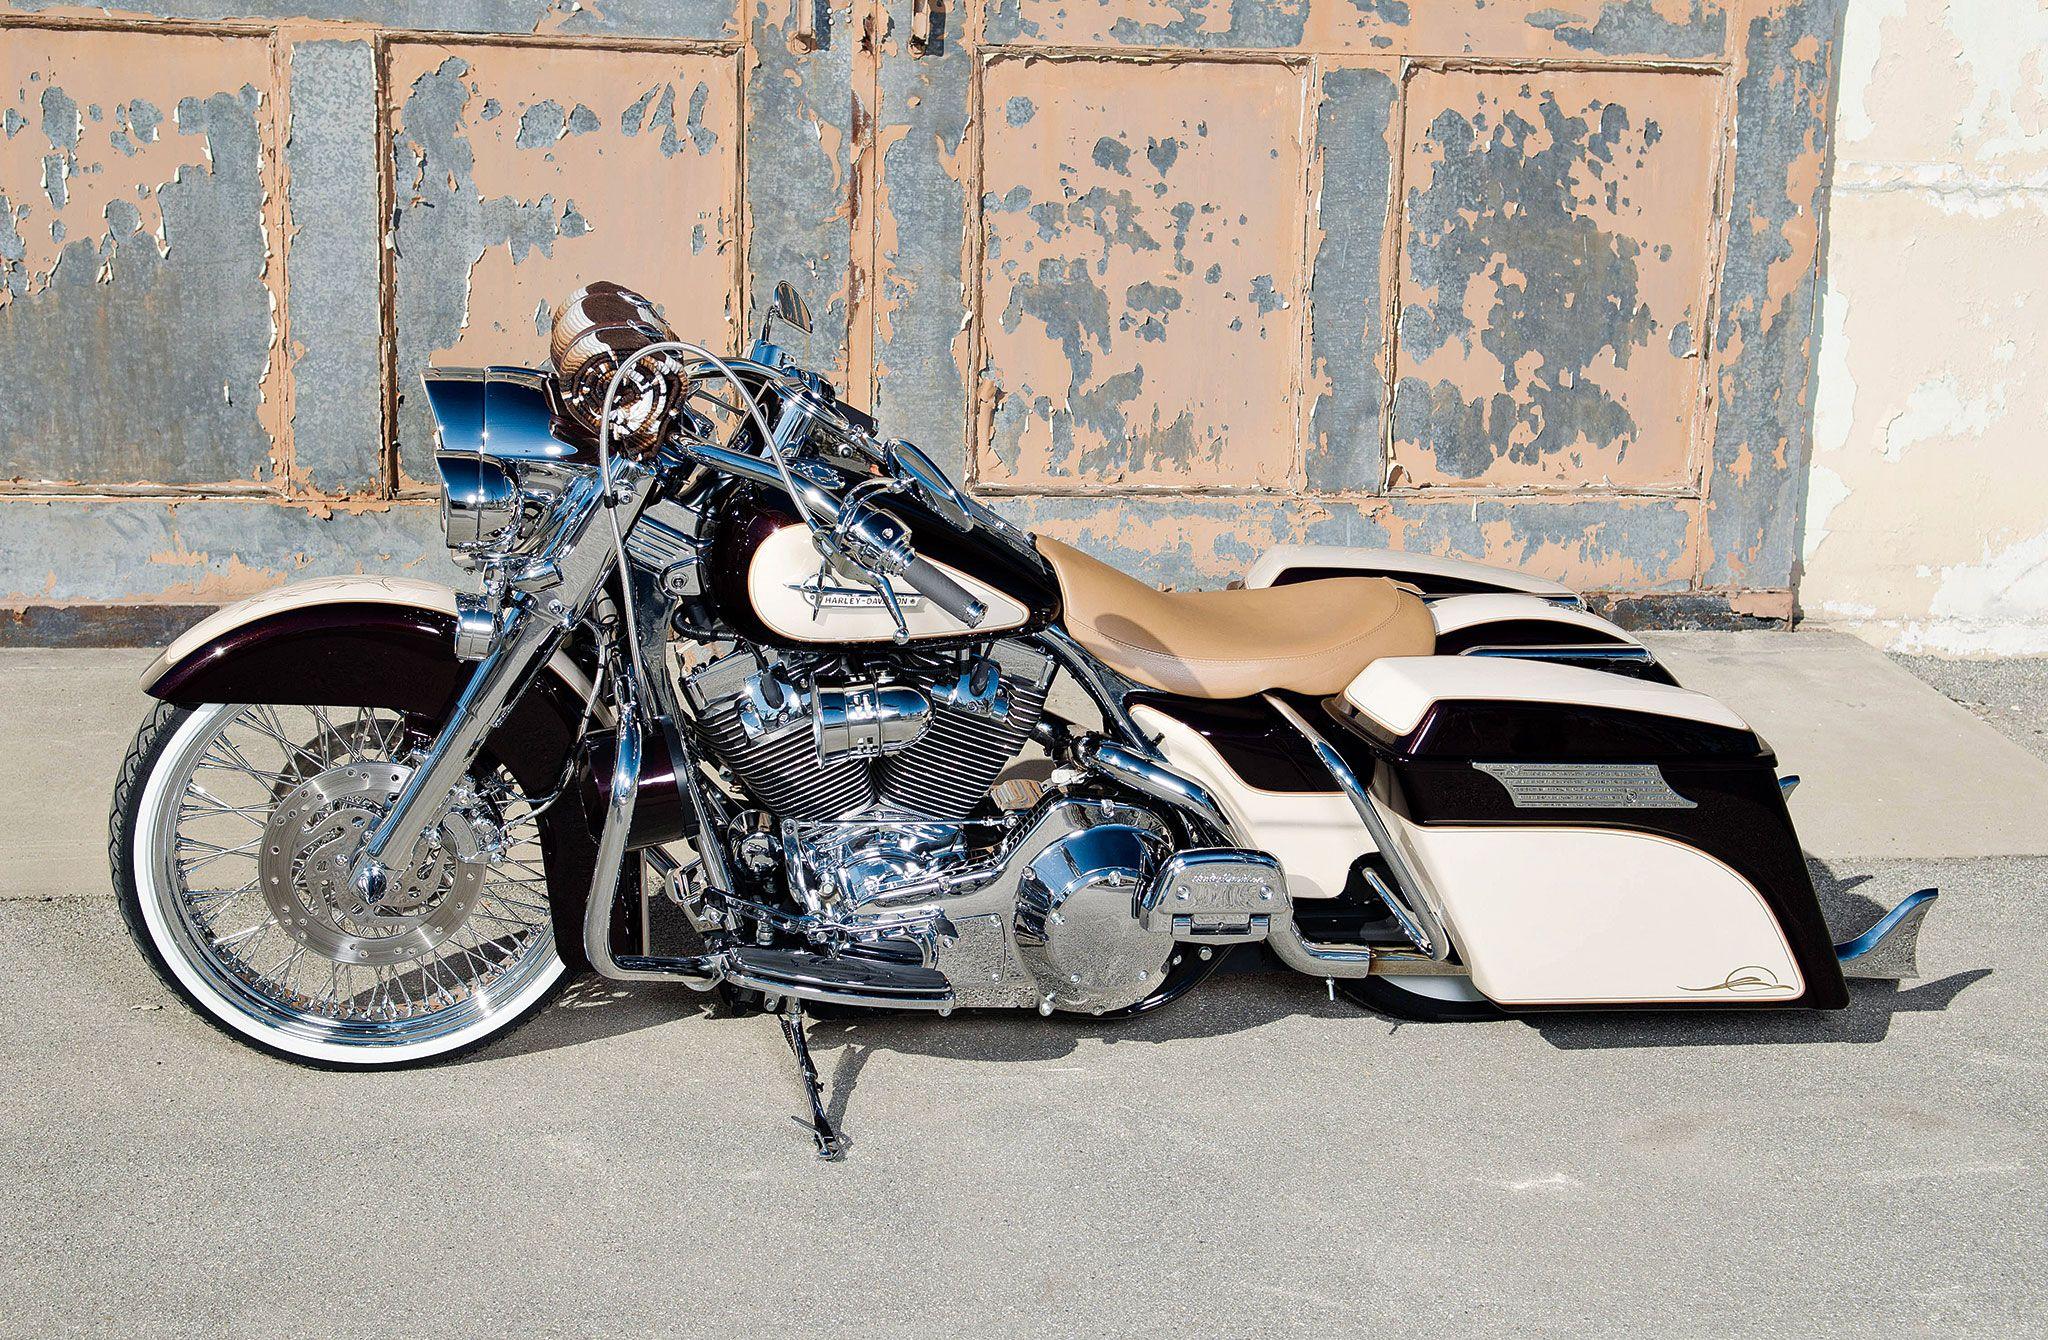 2002-harley-davidson-road-king-side-view-01